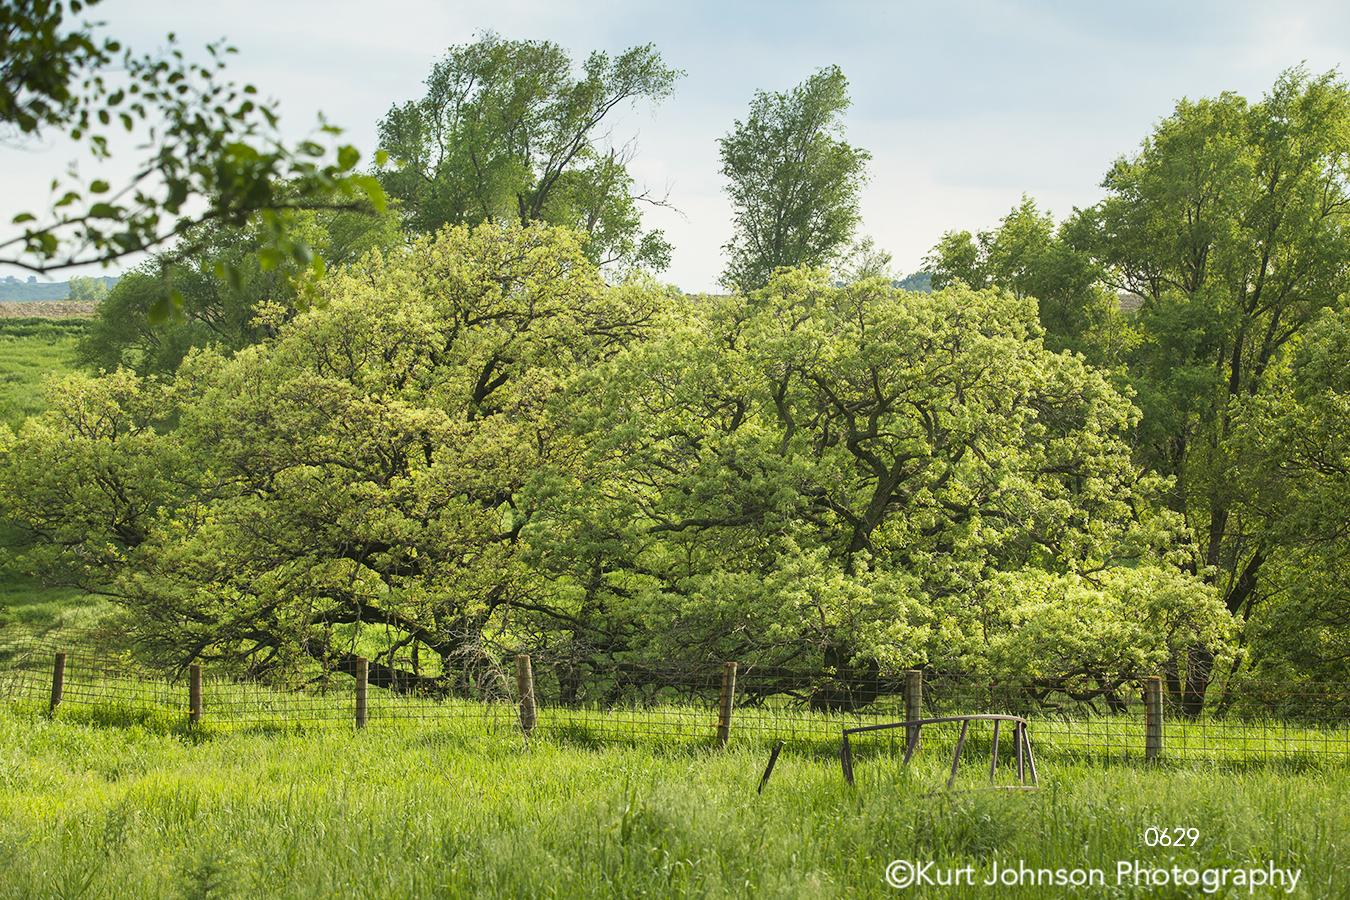 landscape trees grasses green rural